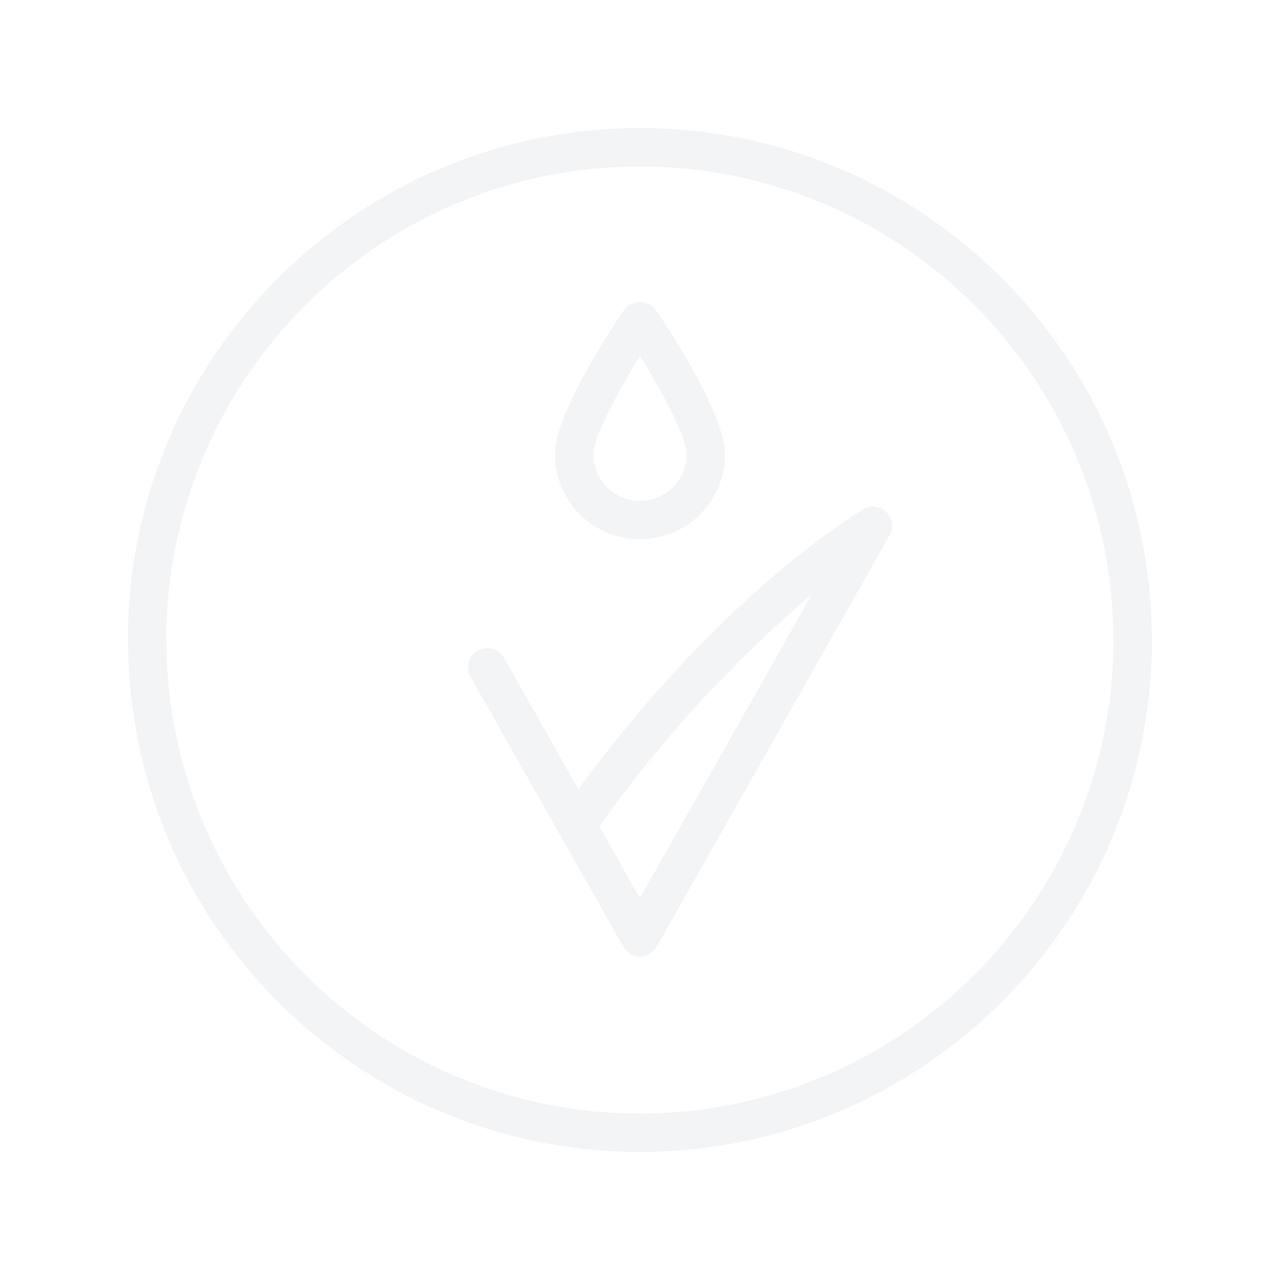 THE VINTAGE COSMETIC Smokey Eye Brush Gift Set подарочный набор для макияжа глаз